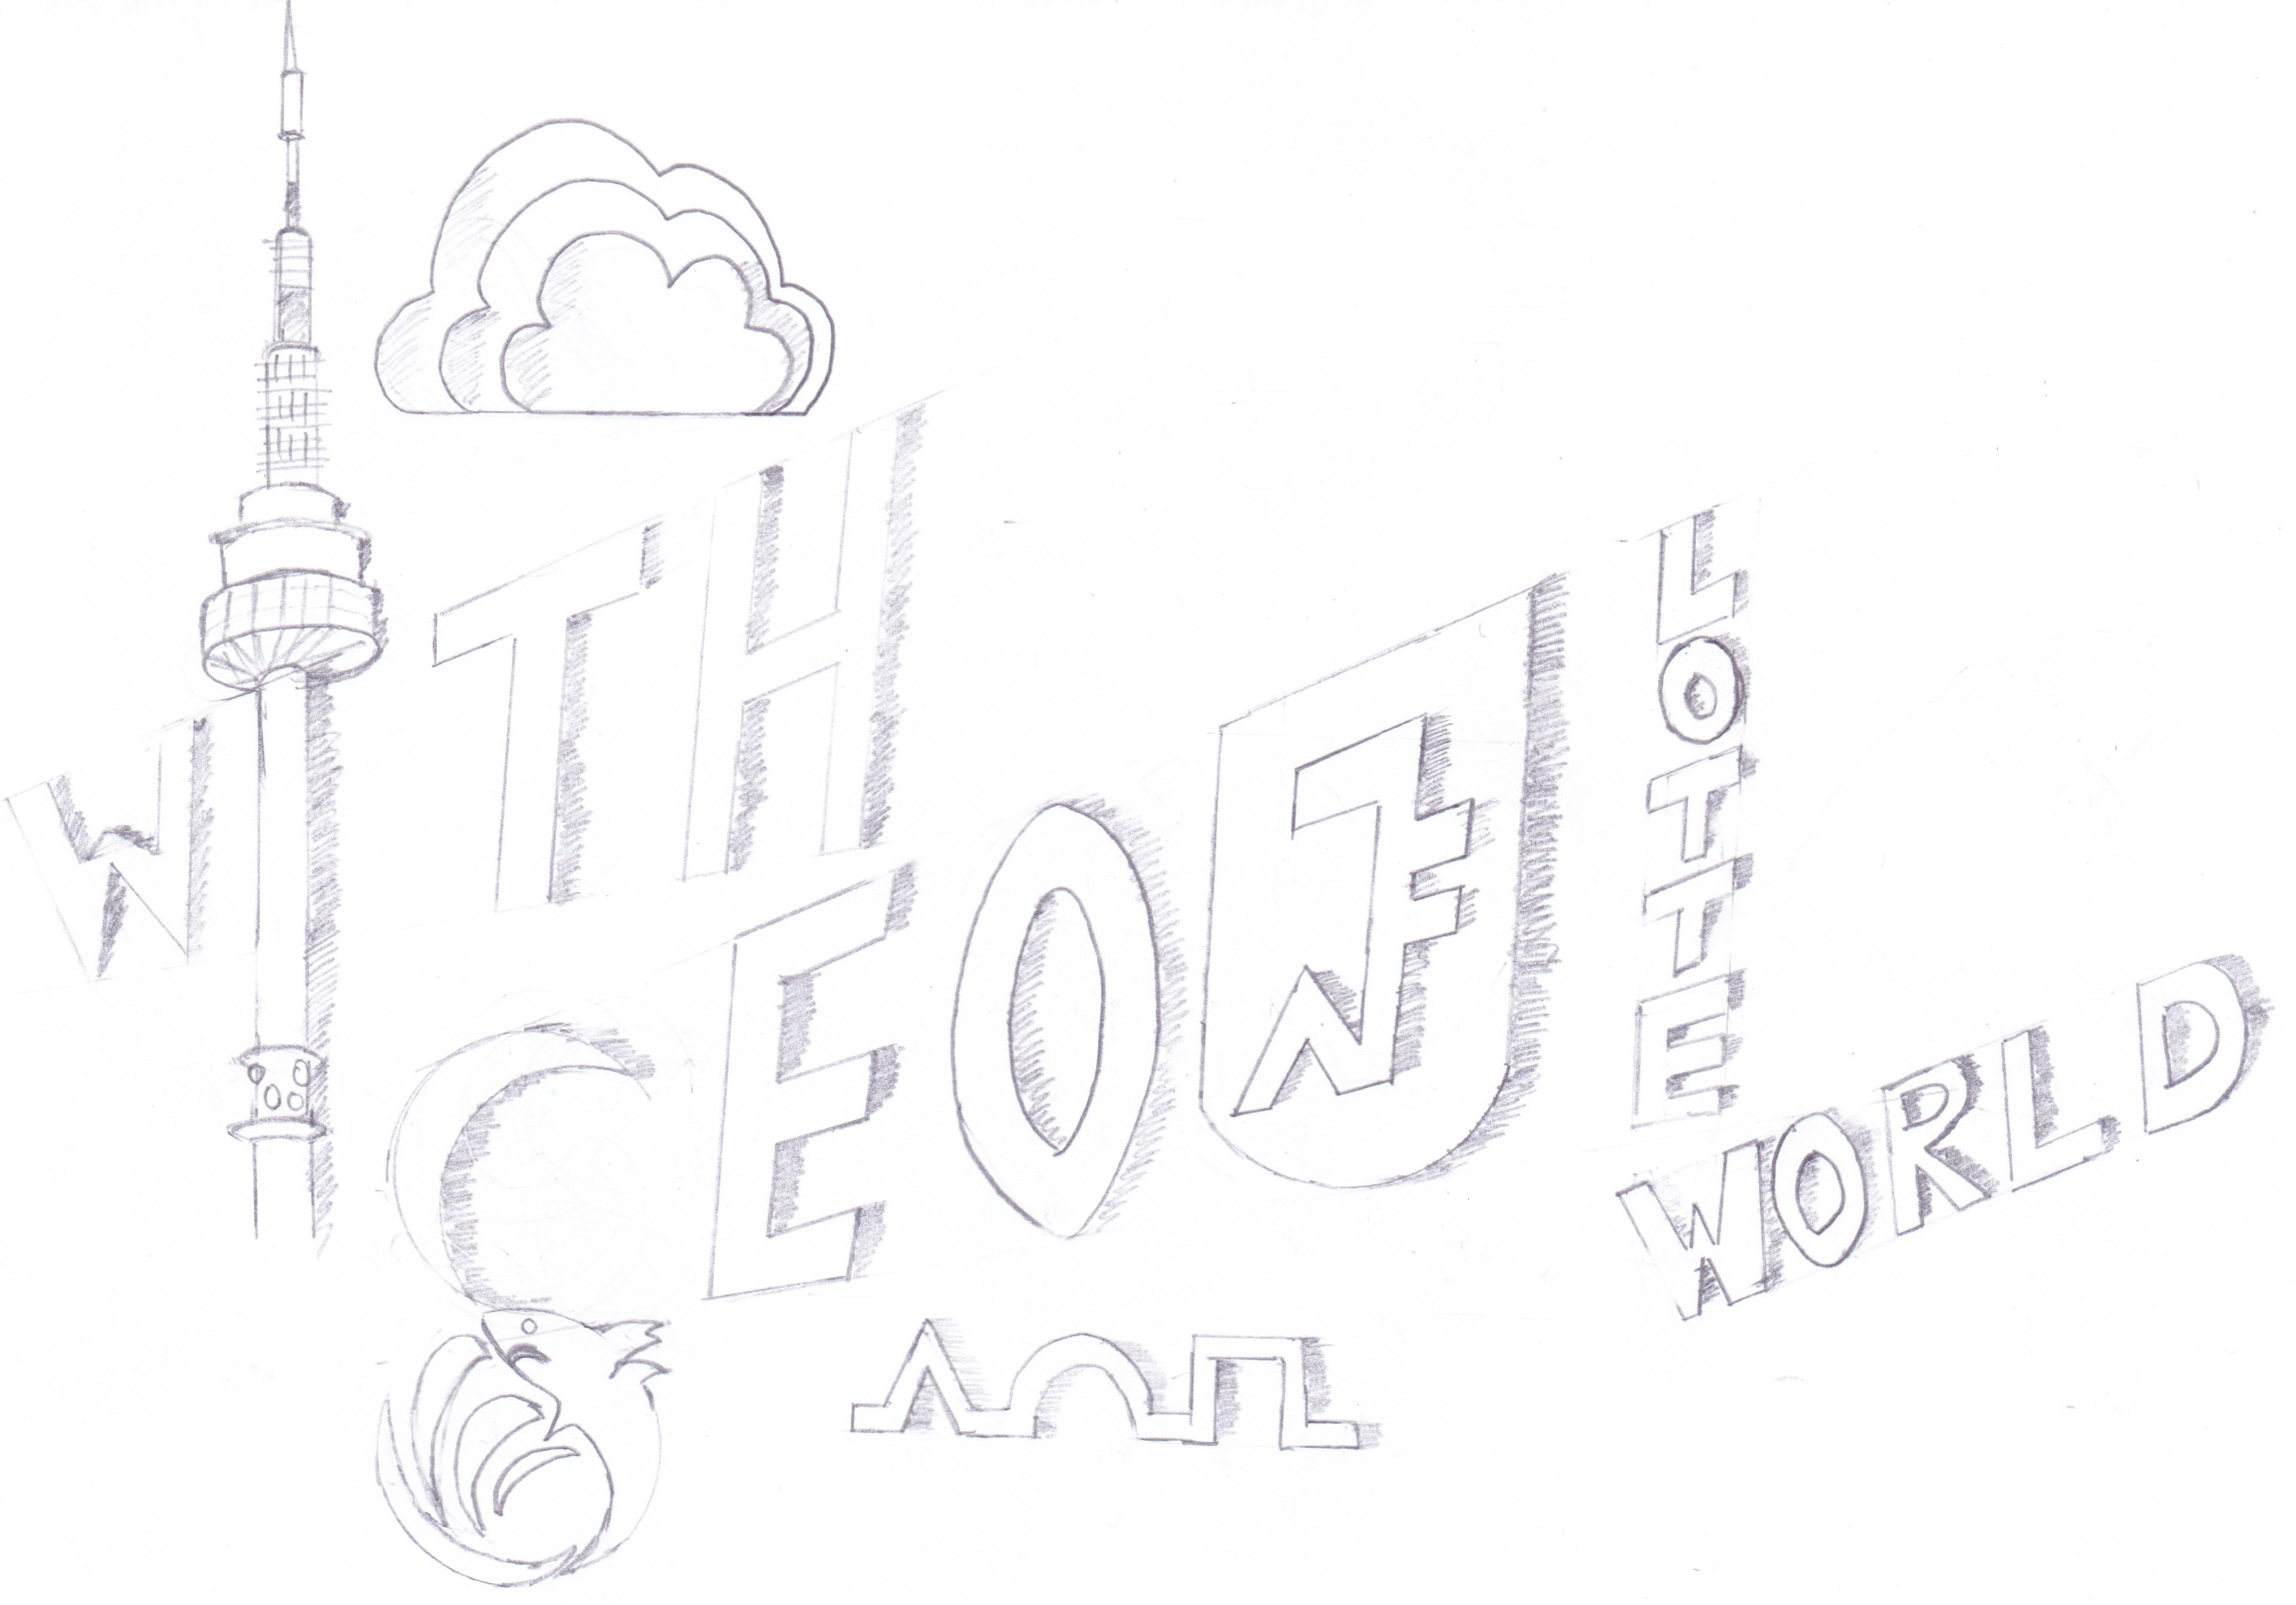 Seoul Typography Contest - Seng Kian Chee